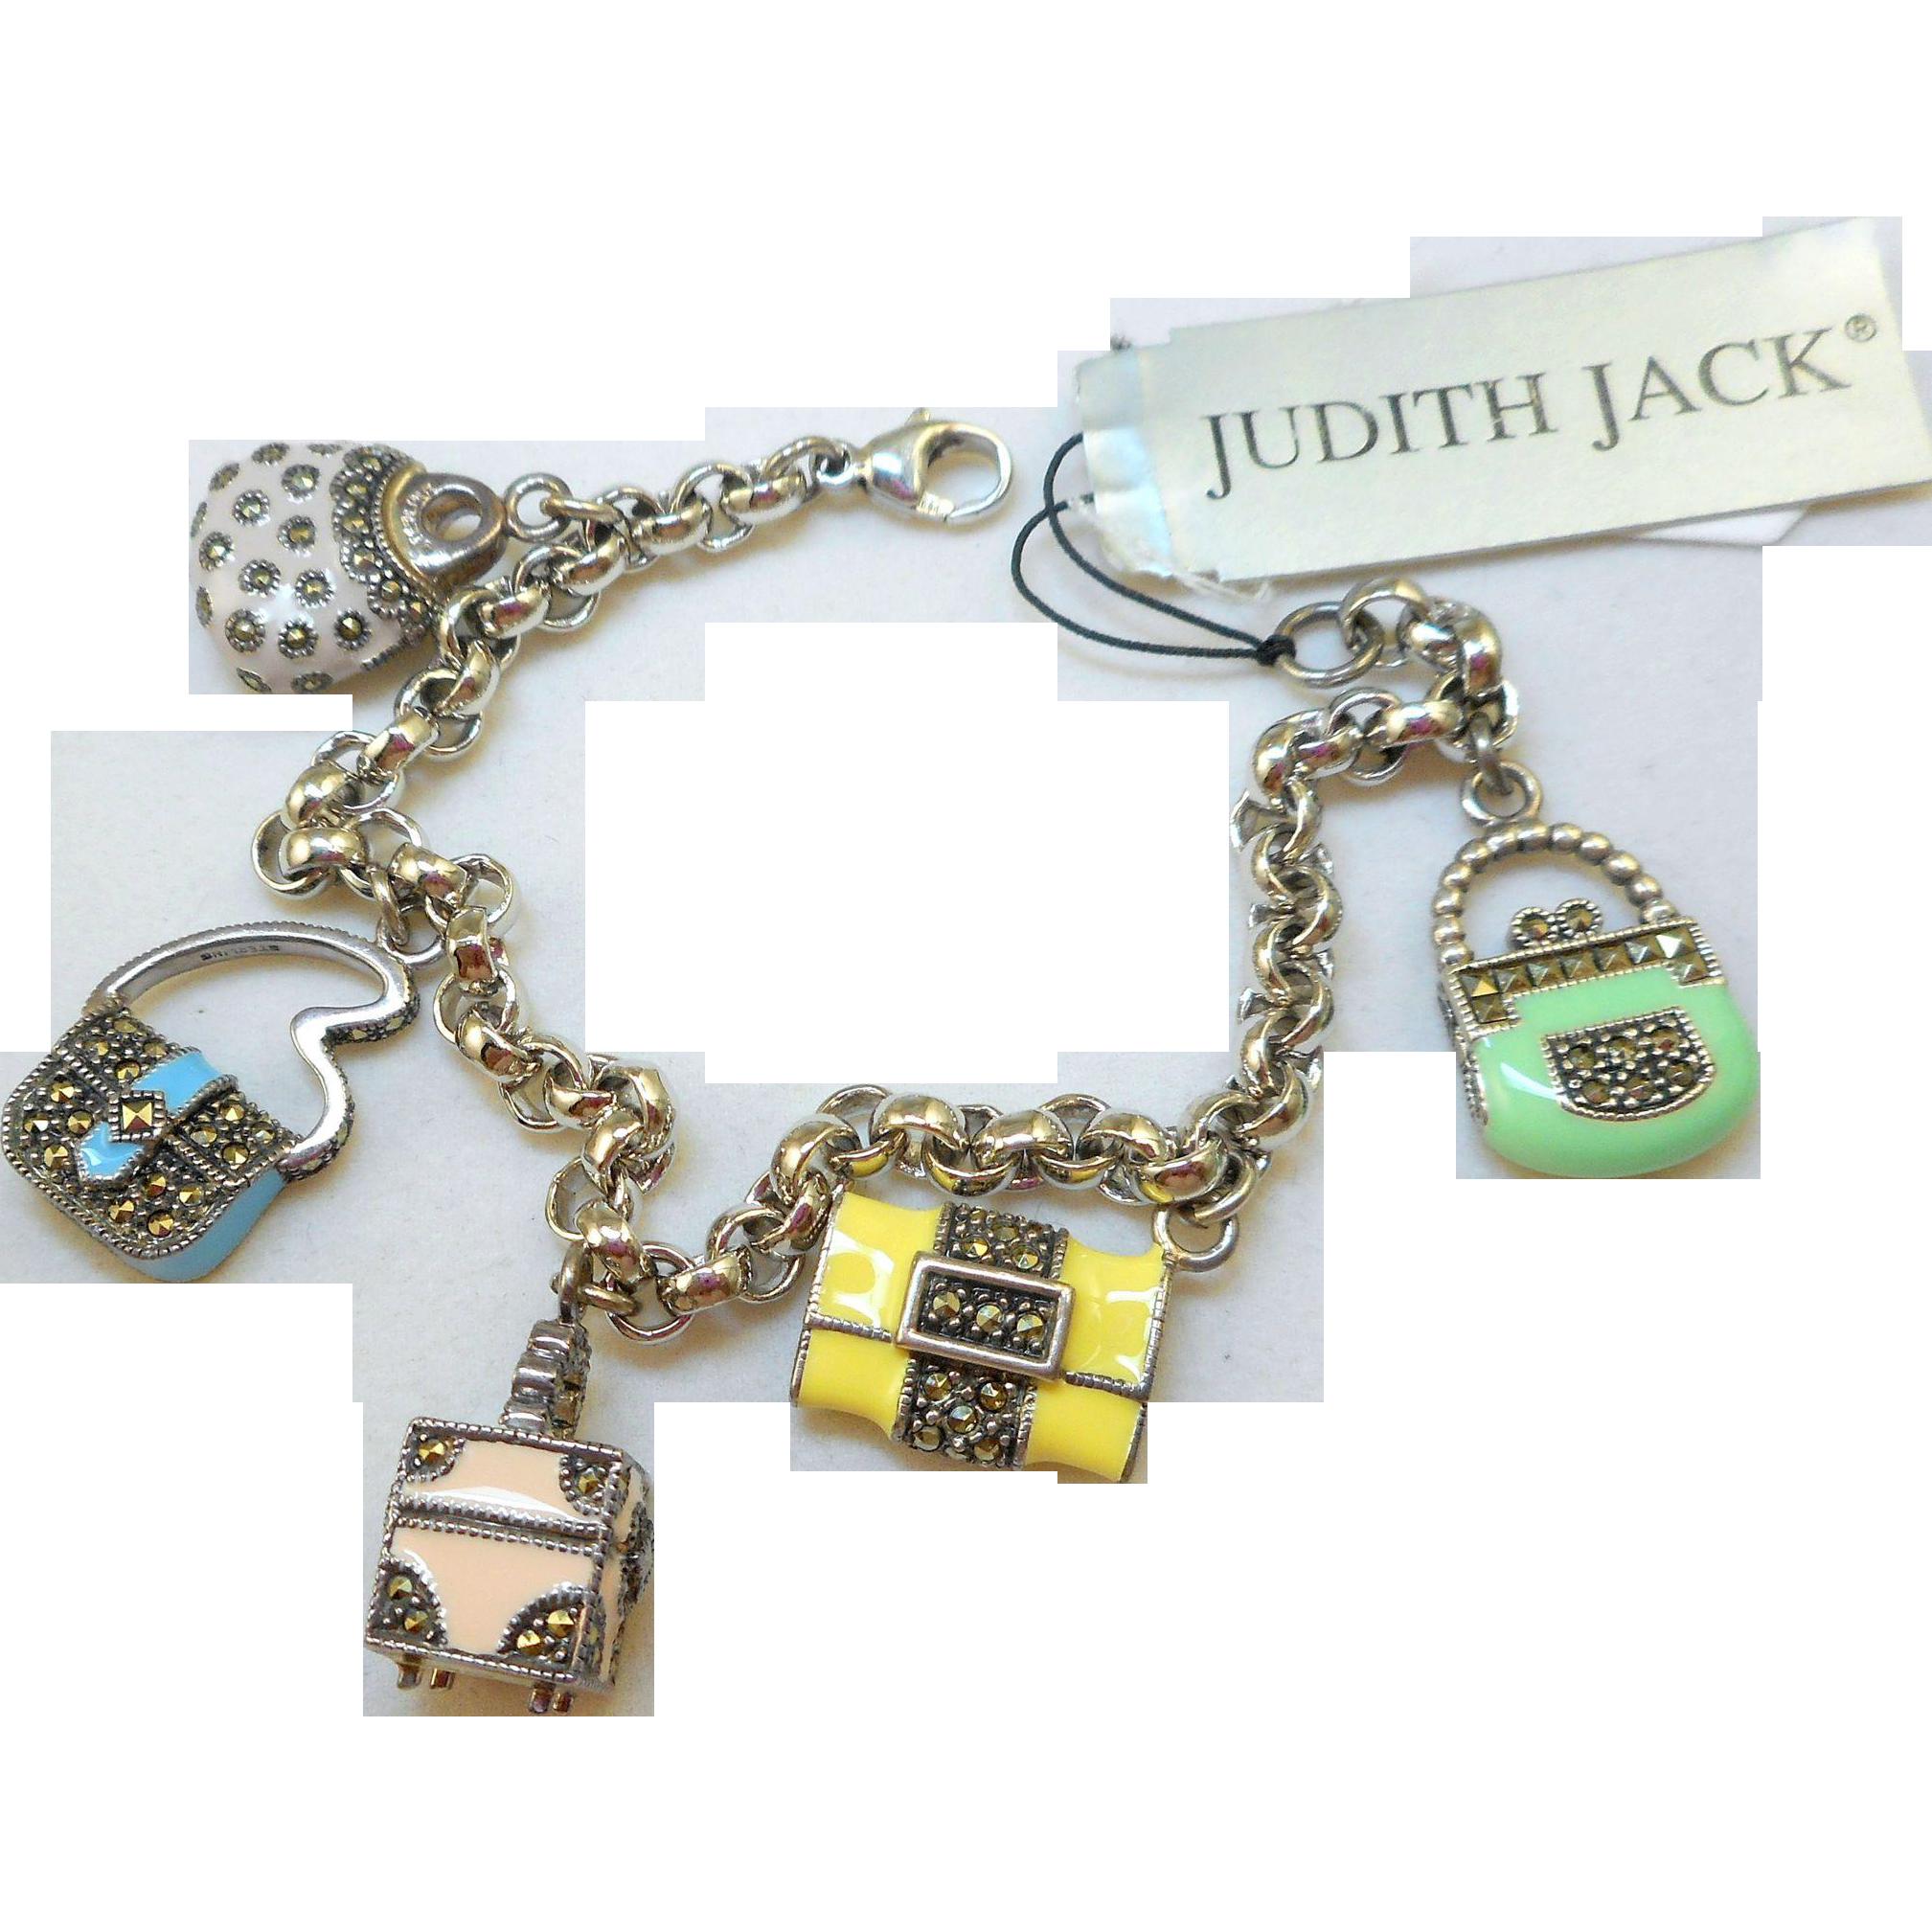 Judith Jack Charm Bracelet With Purses Nos Alison S Antiques Vintage Jewelry Ruby Lane